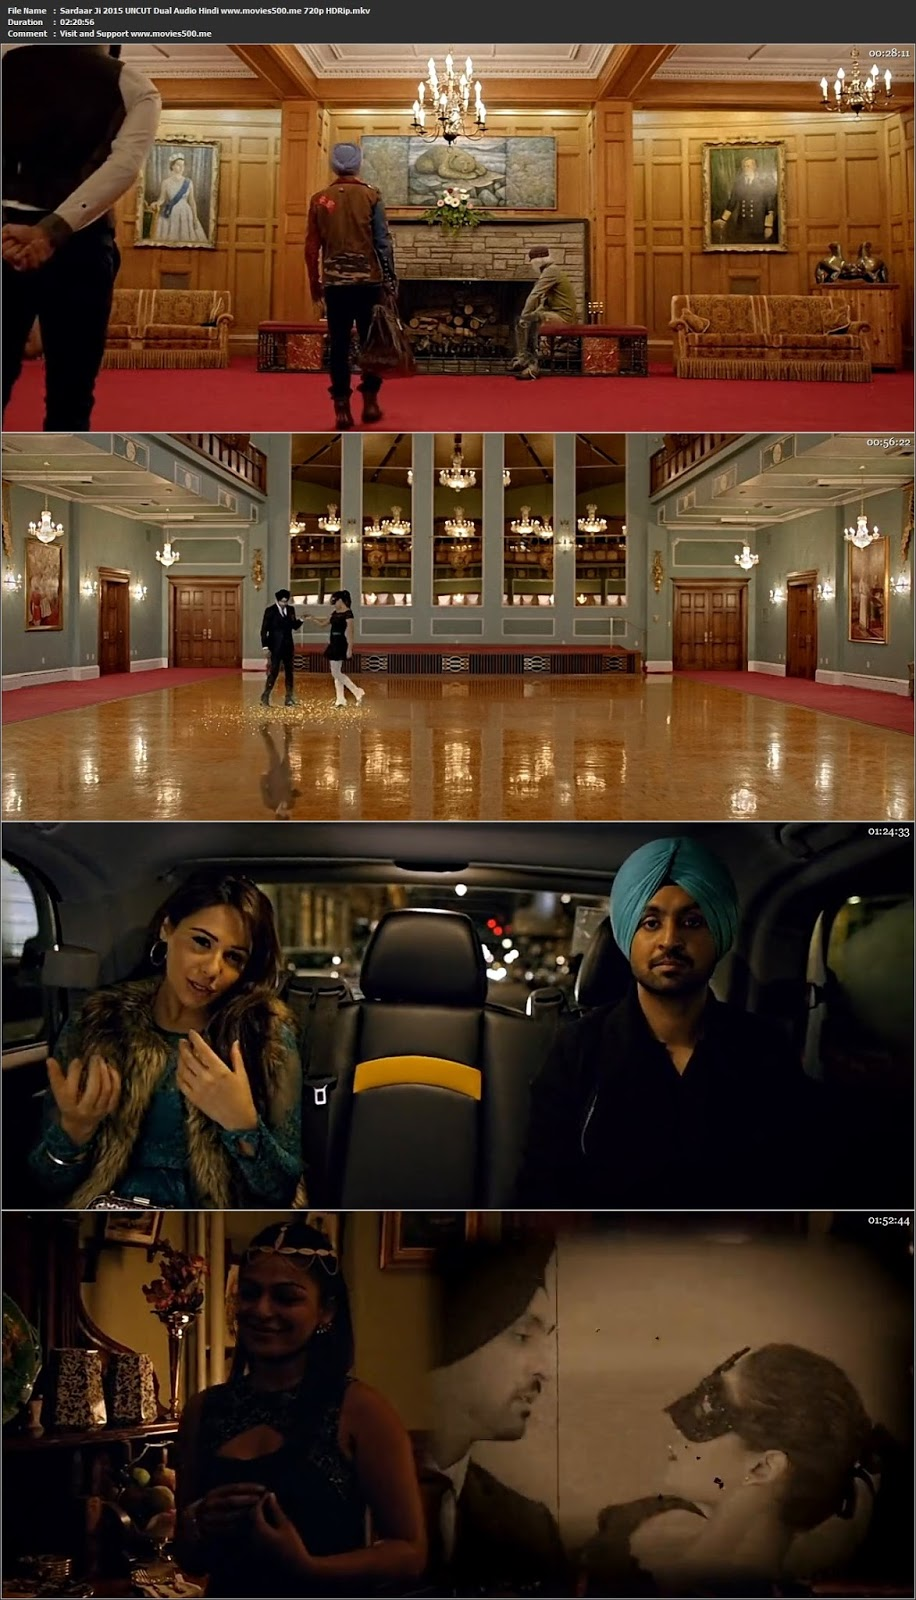 Sardaar Ji 2015 UNCUT Punjabi Movie HDRip 720p 1.4GB at sidsays.org.uk